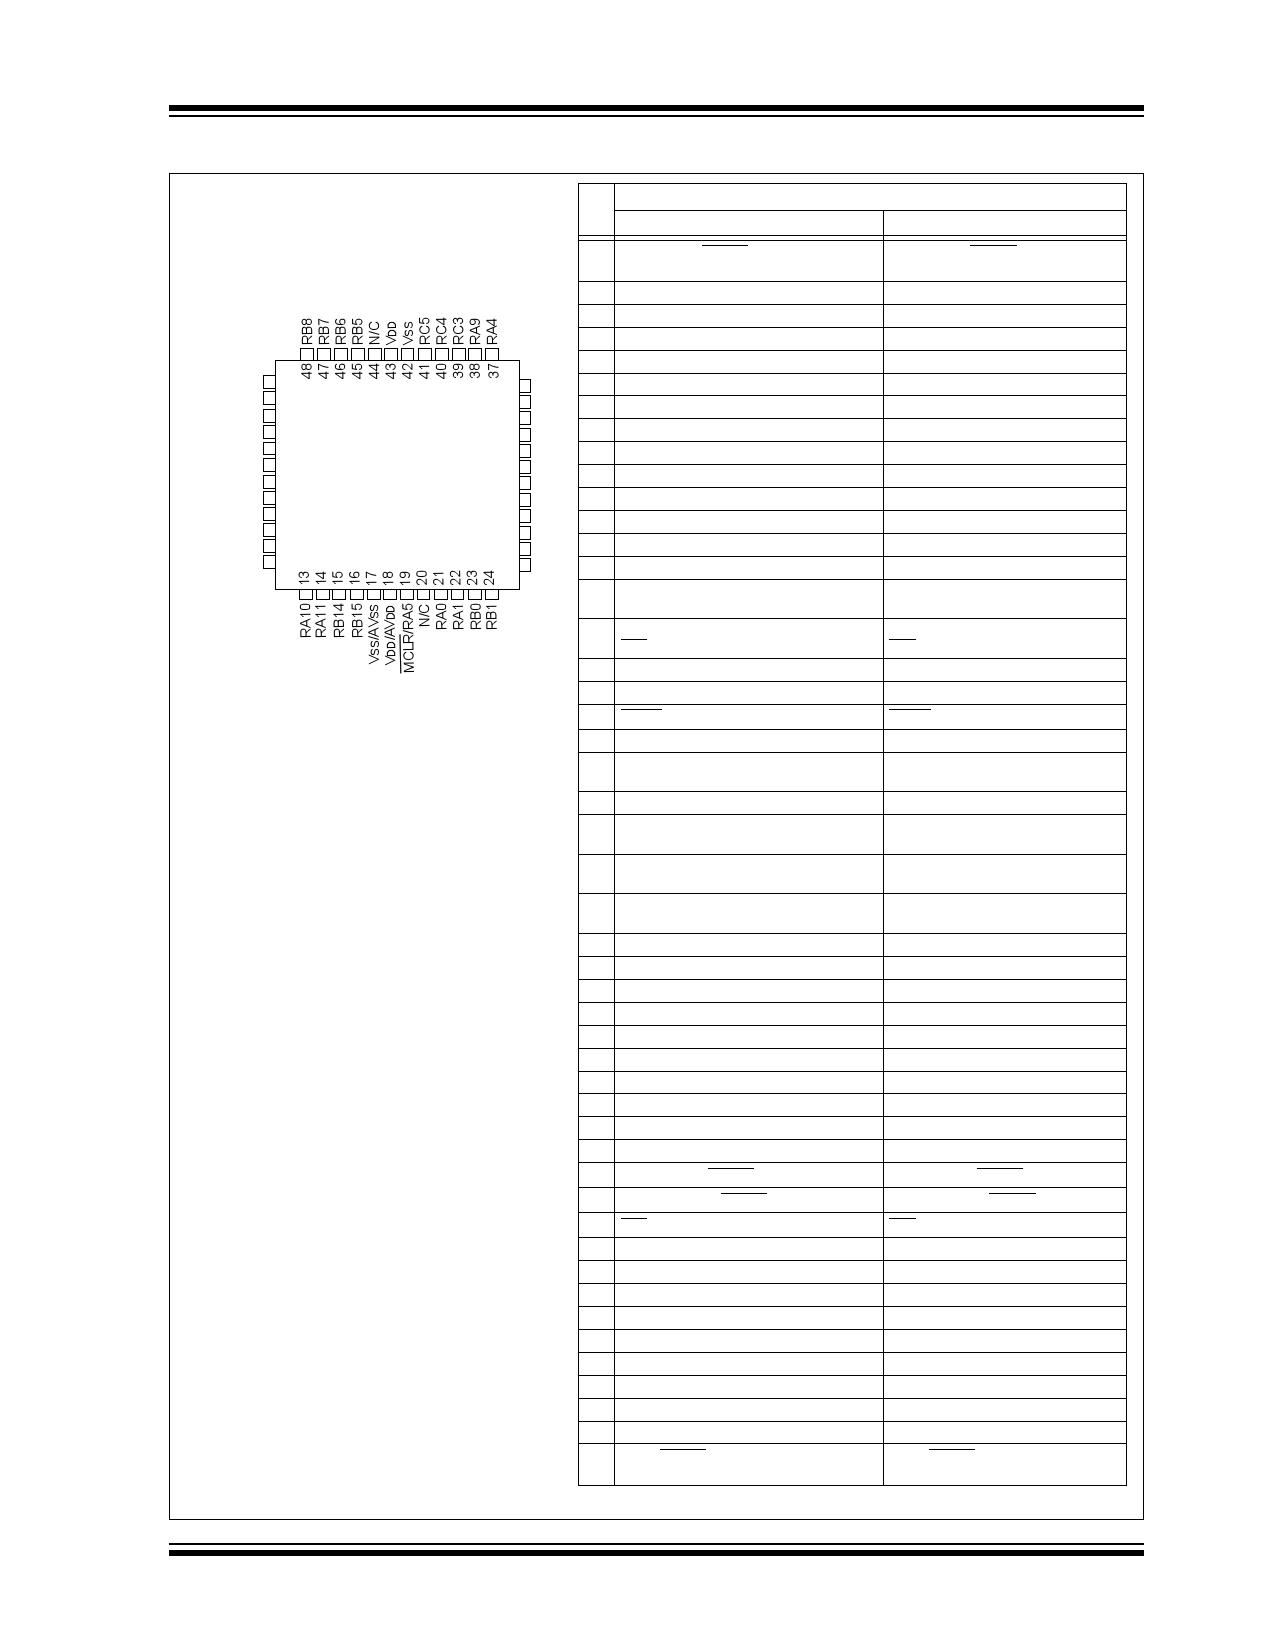 PIC24F32KA304 전자부품, 판매, 대치품